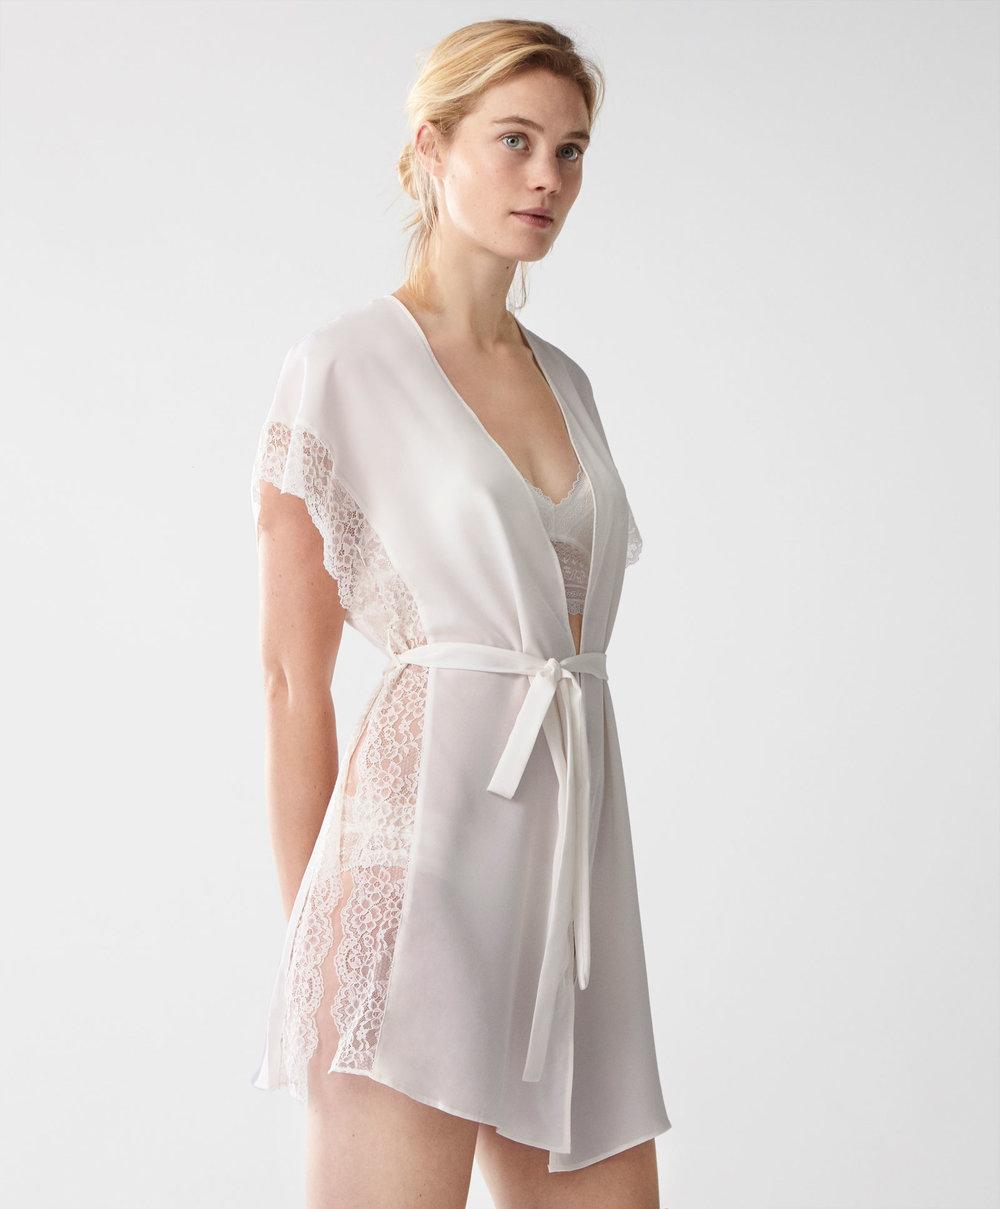 blog-mariage-parisian-inspired-lingerie0791180959_1_1_1.jpg